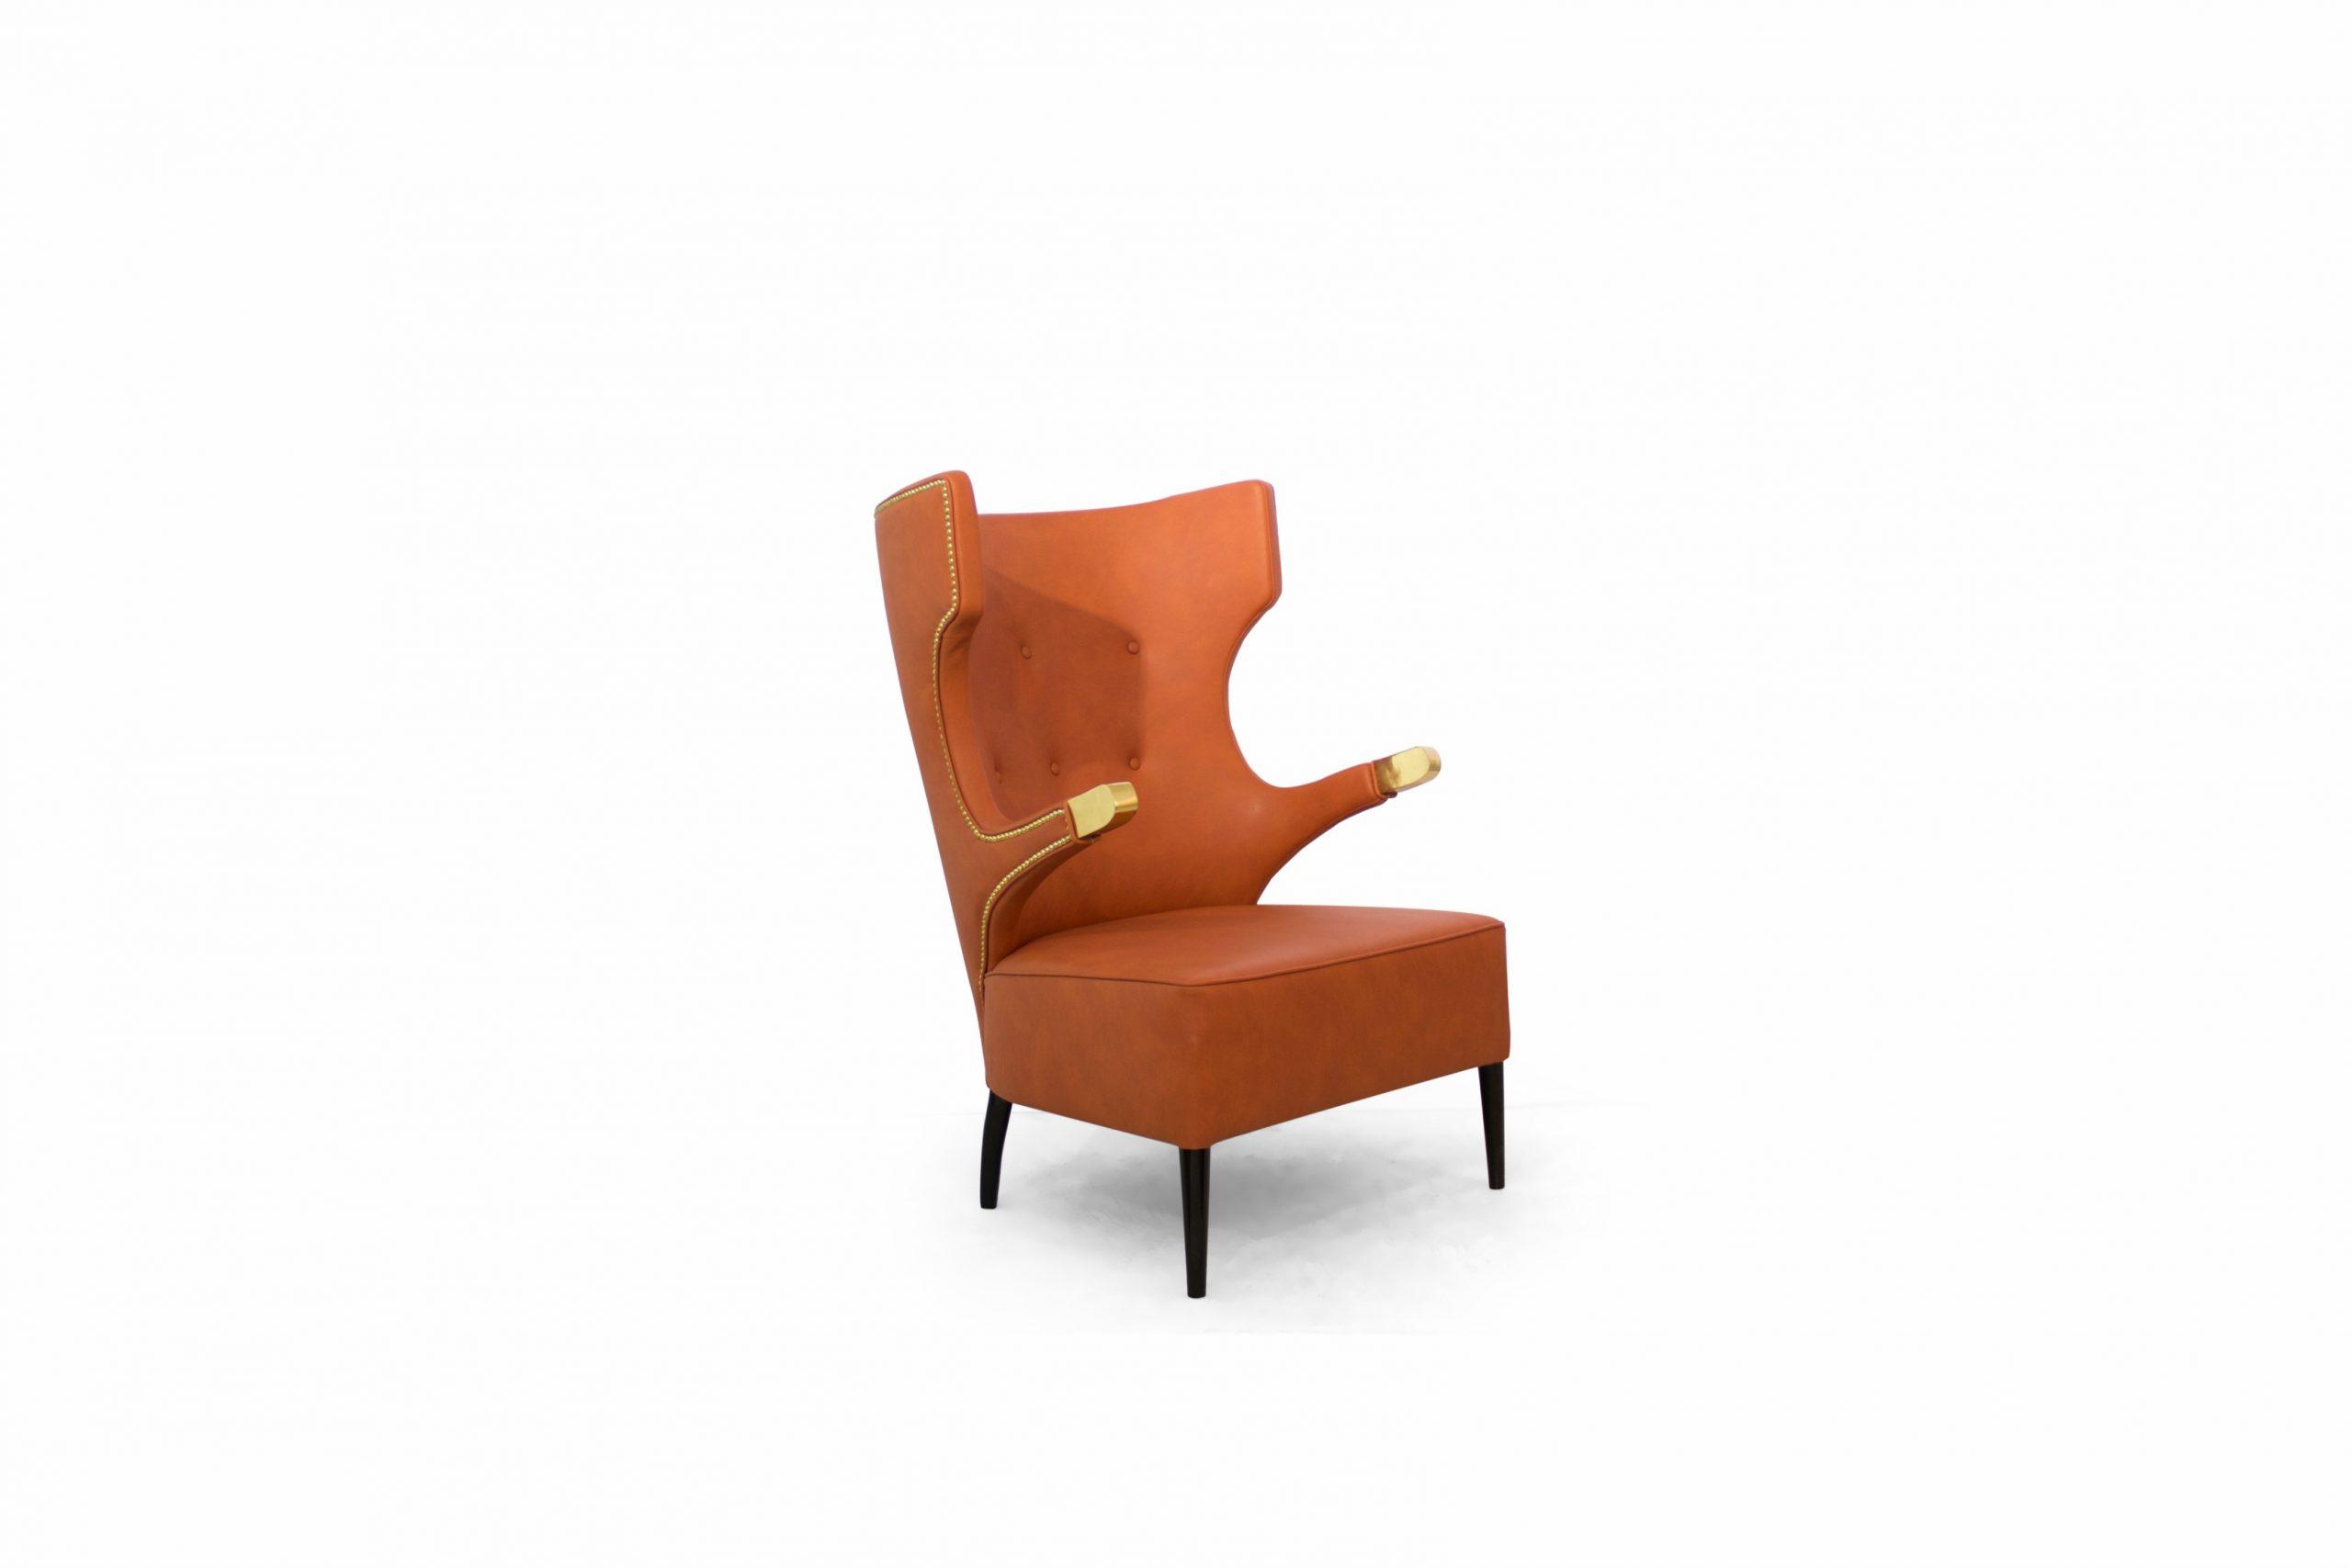 maison et objet 2020 Maison et Objet 2020: The Best of Modern Chairs Maison et Objet 2020 The Best of Modern Chairs 5 scaled